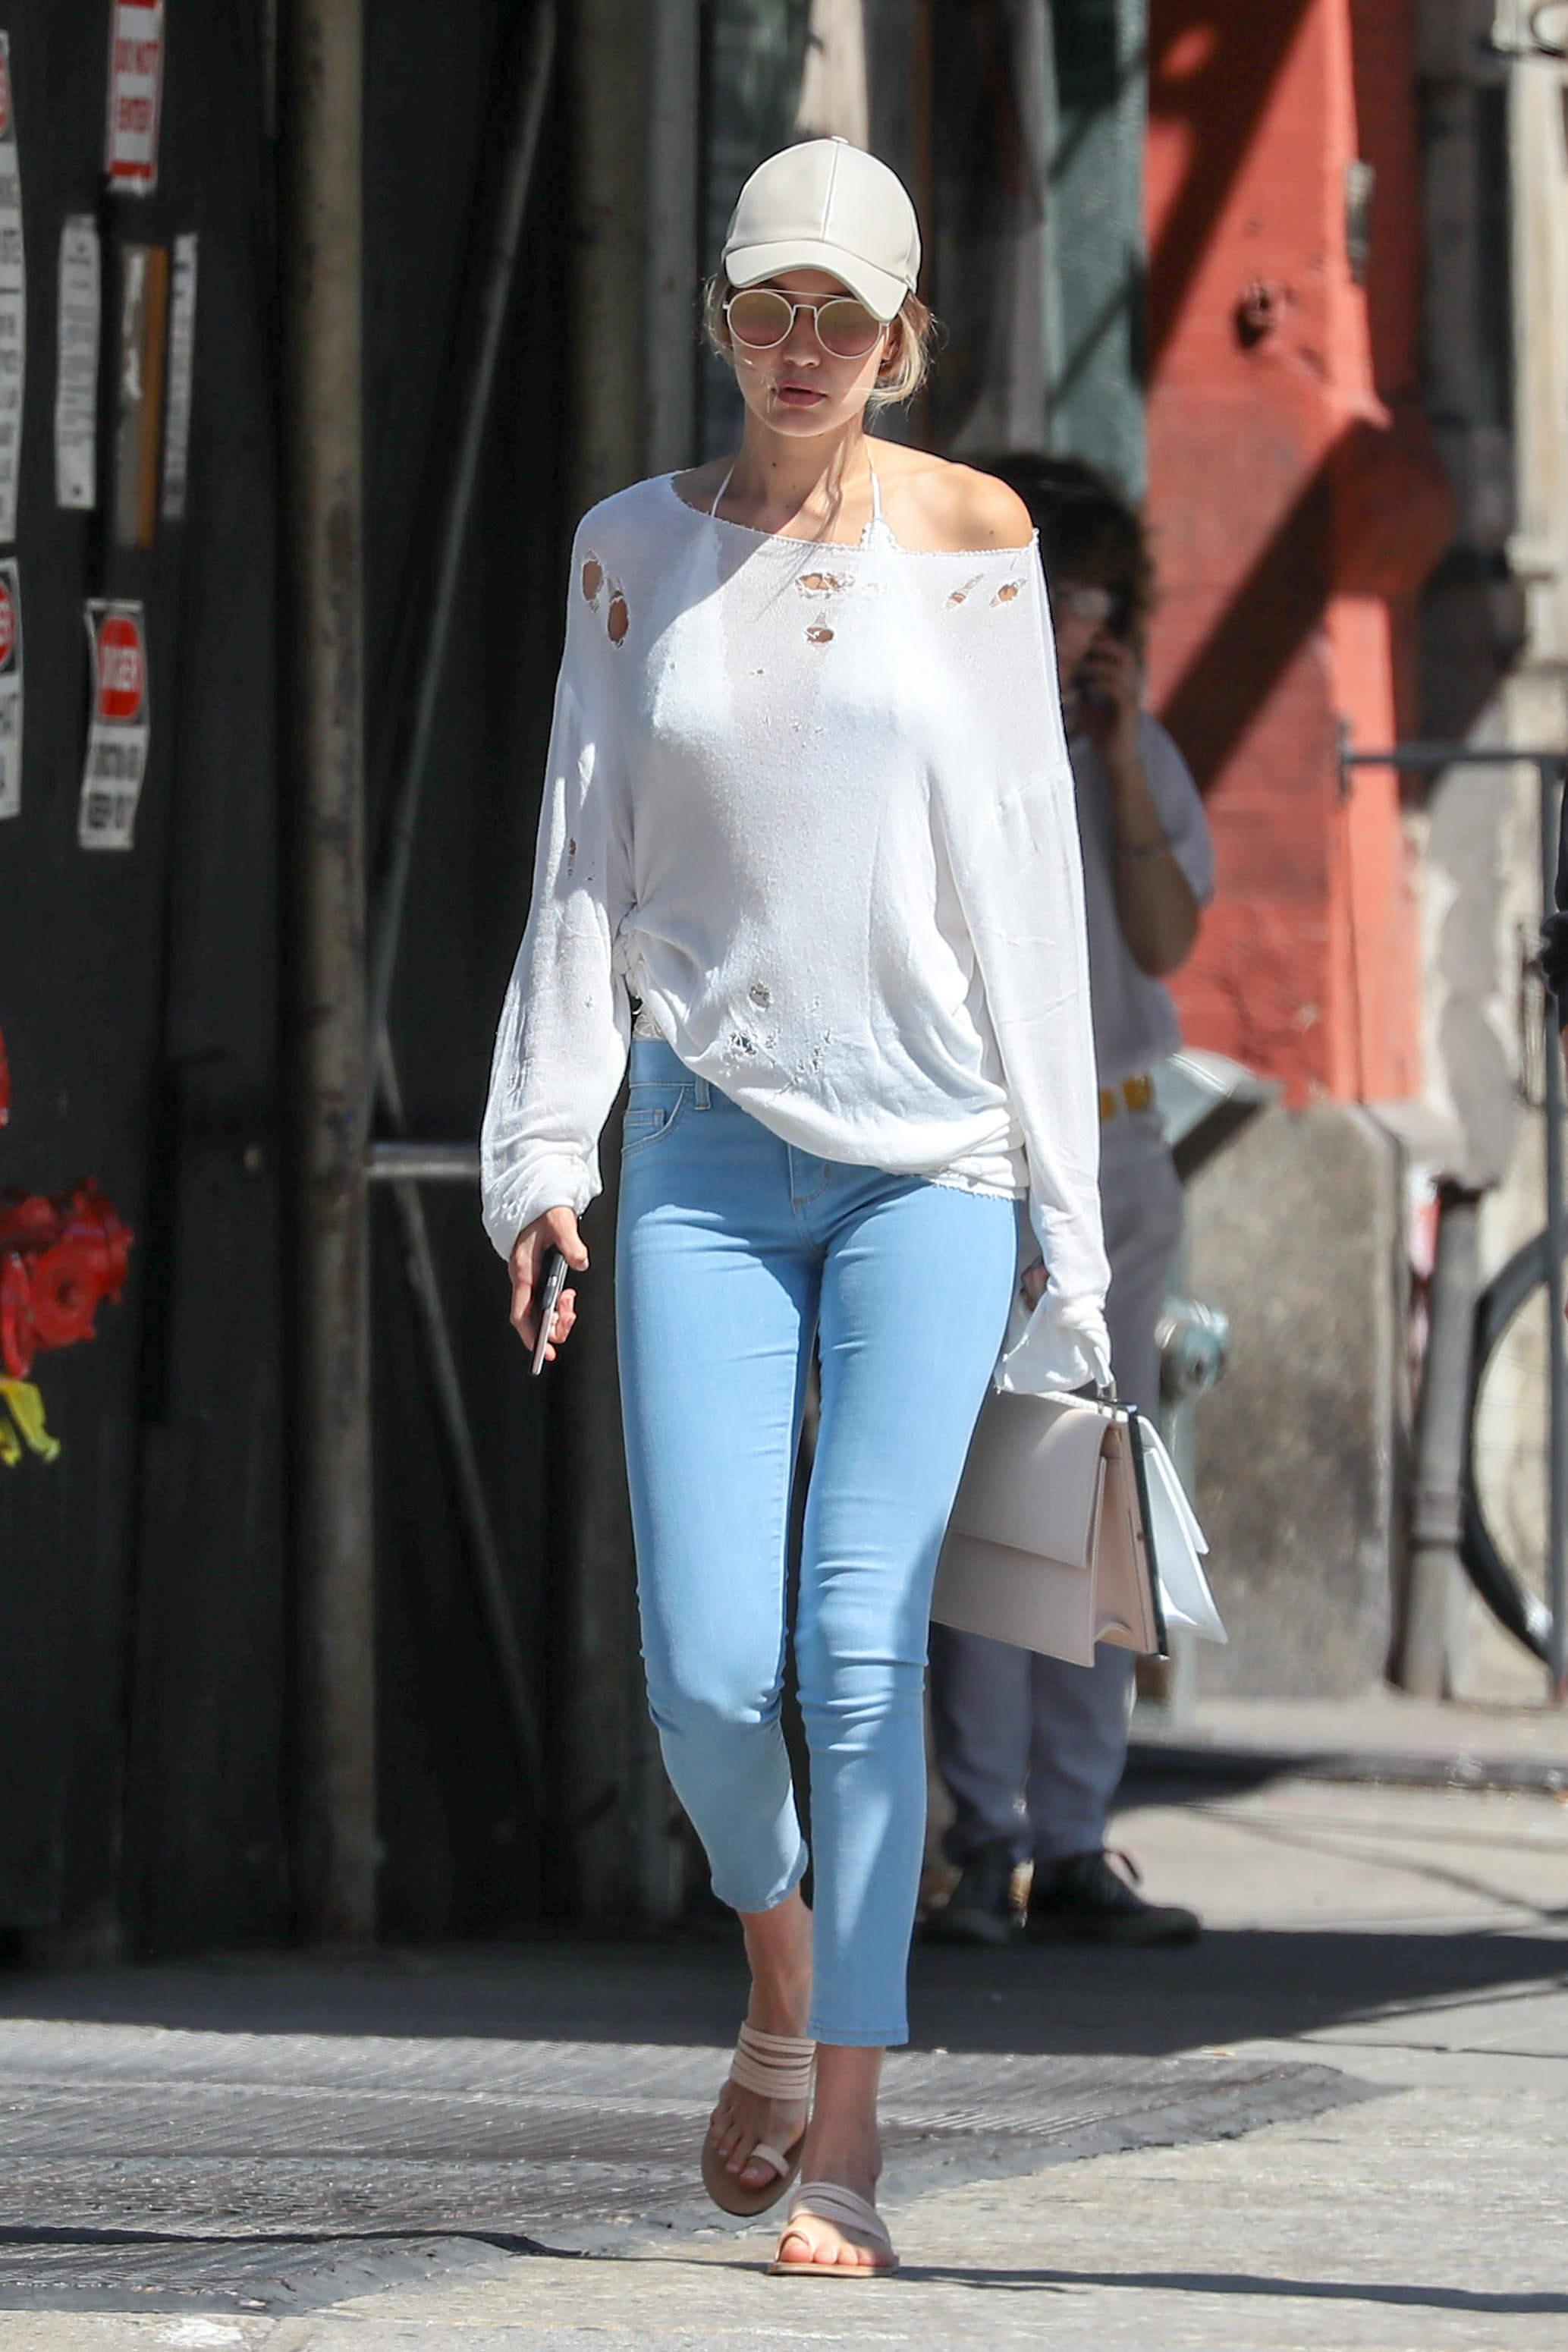 Gigi Hadid strolling through New York in her totes caj dad cap.